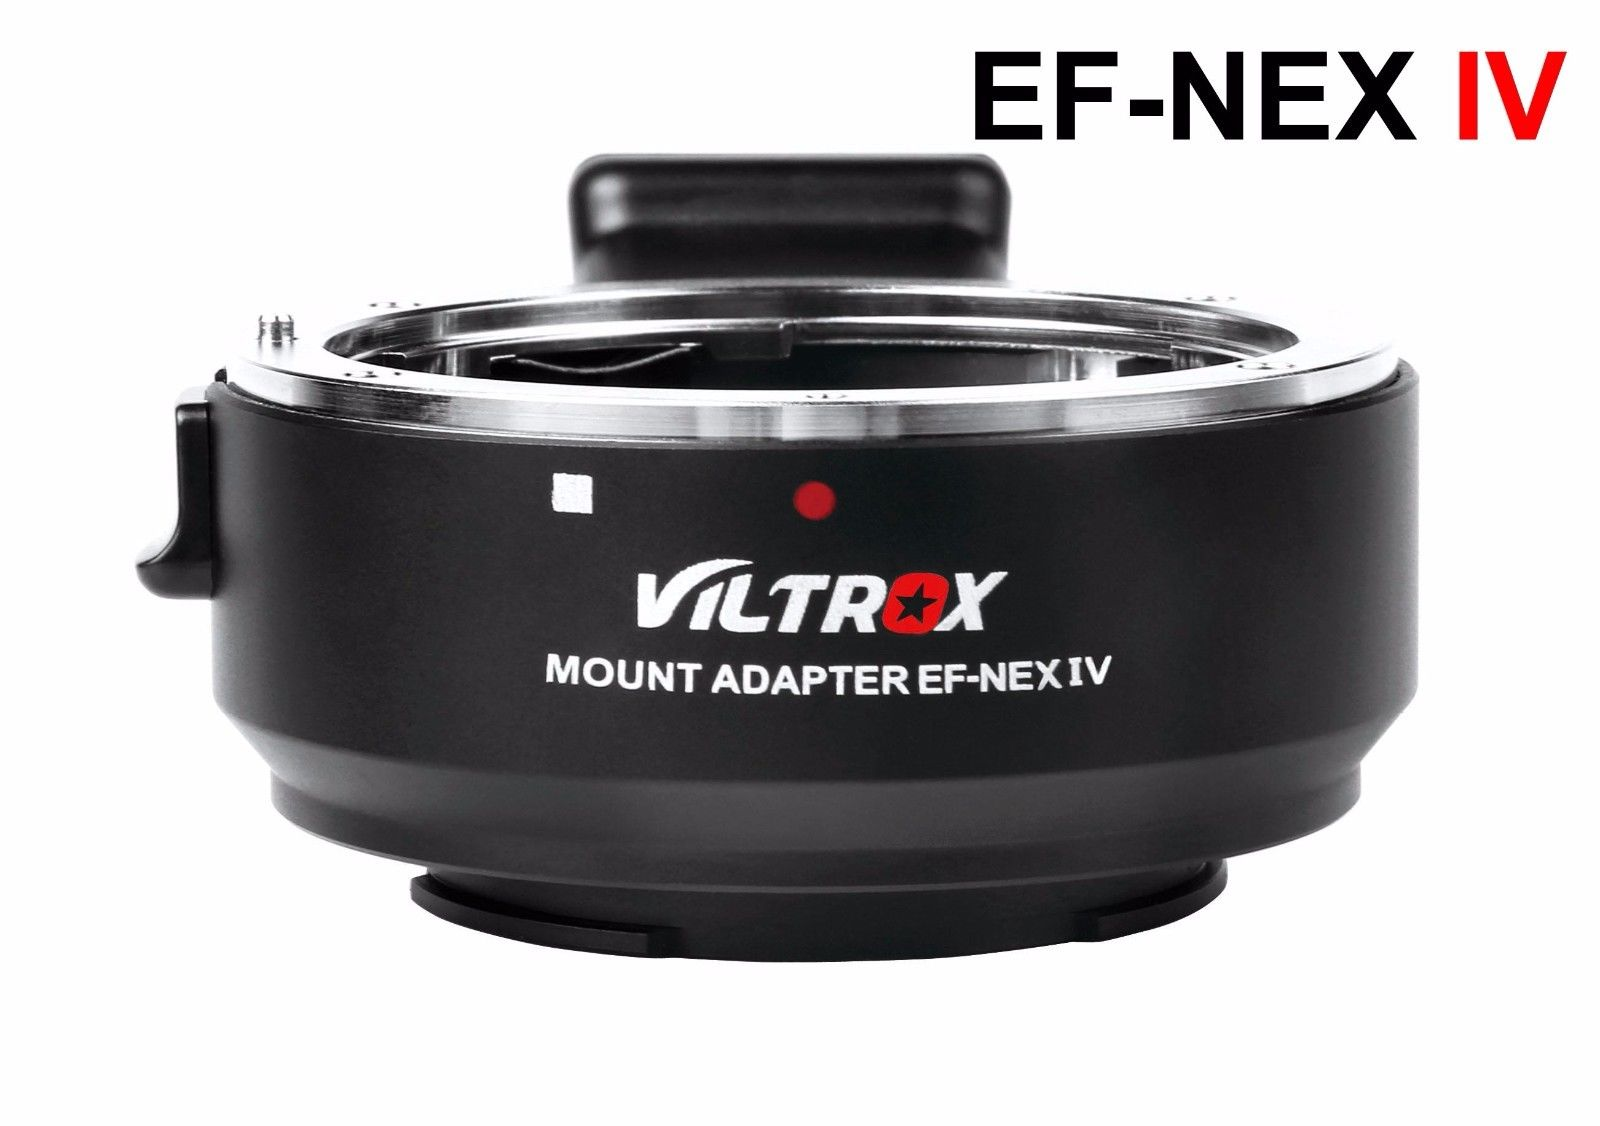 Viltrox EF-NEX IV Auto Focus Lens Adapter for Canon EOS EF EF-S Lens to Sony E NEX Full Frame A9 A7 A7II A7RII A7SII A6500 A6300